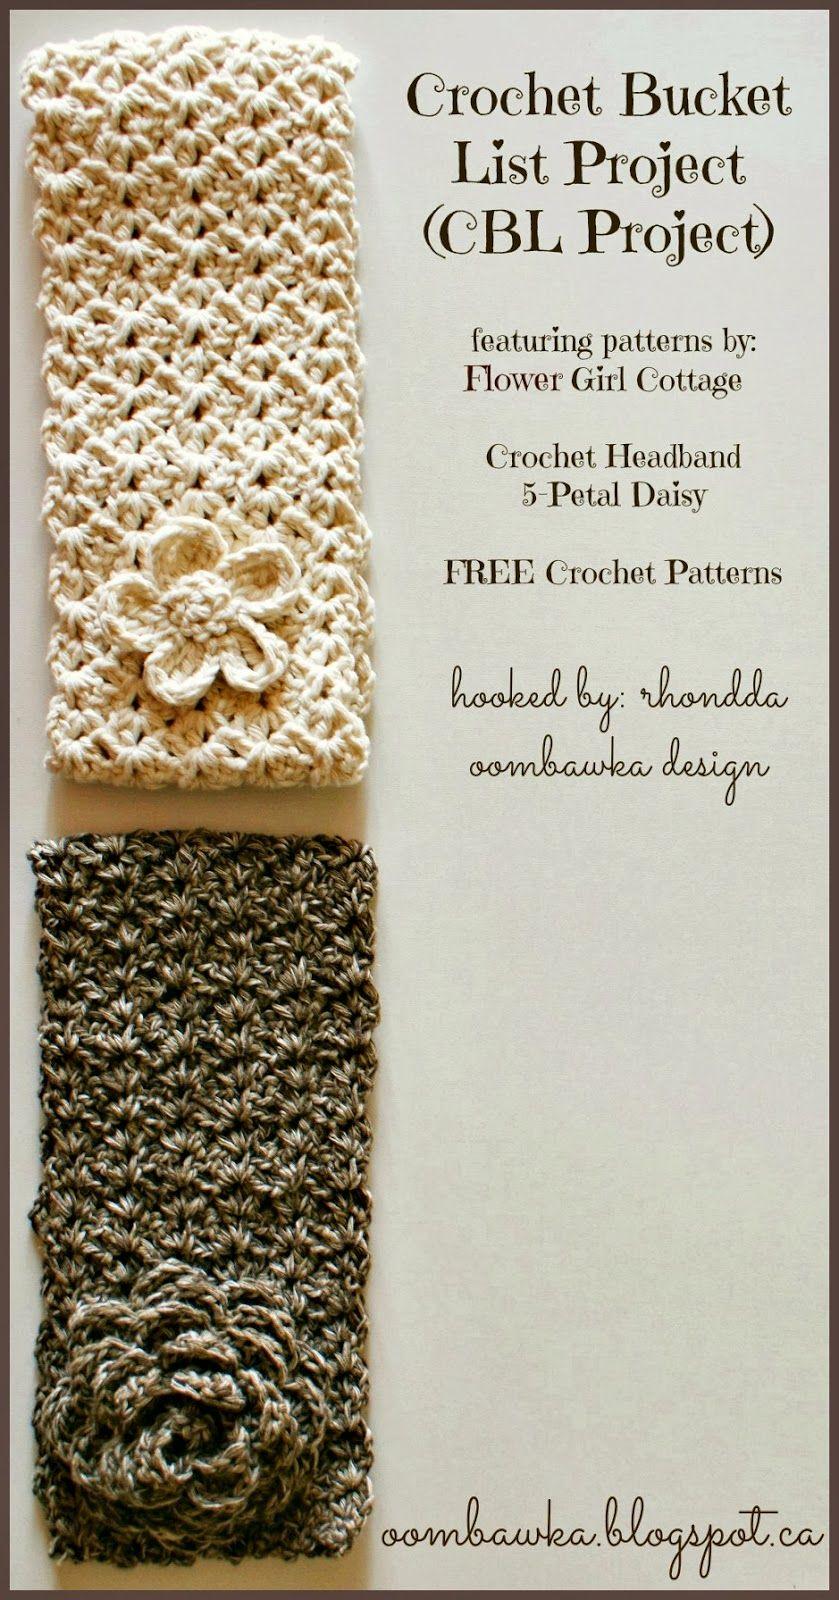 Crochet Headband and 5 Petal Daisy | Ganchillo | Pinterest ...